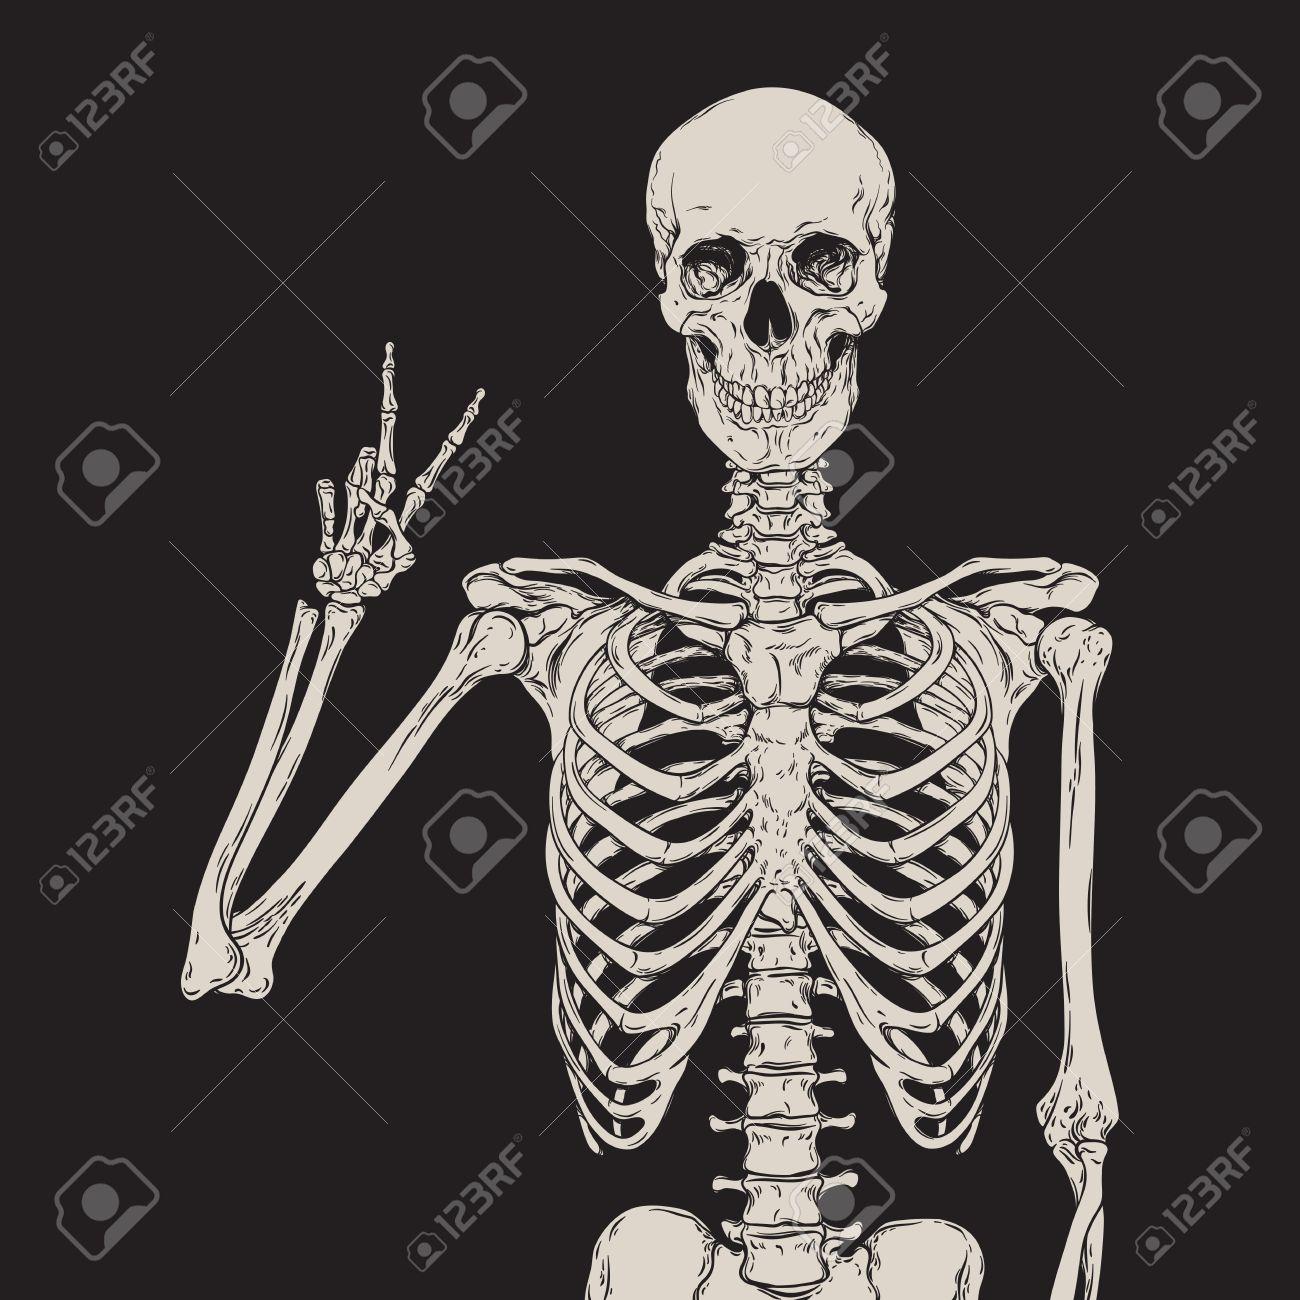 Human skeleton posing isolated over black background vector illustration - 62541050